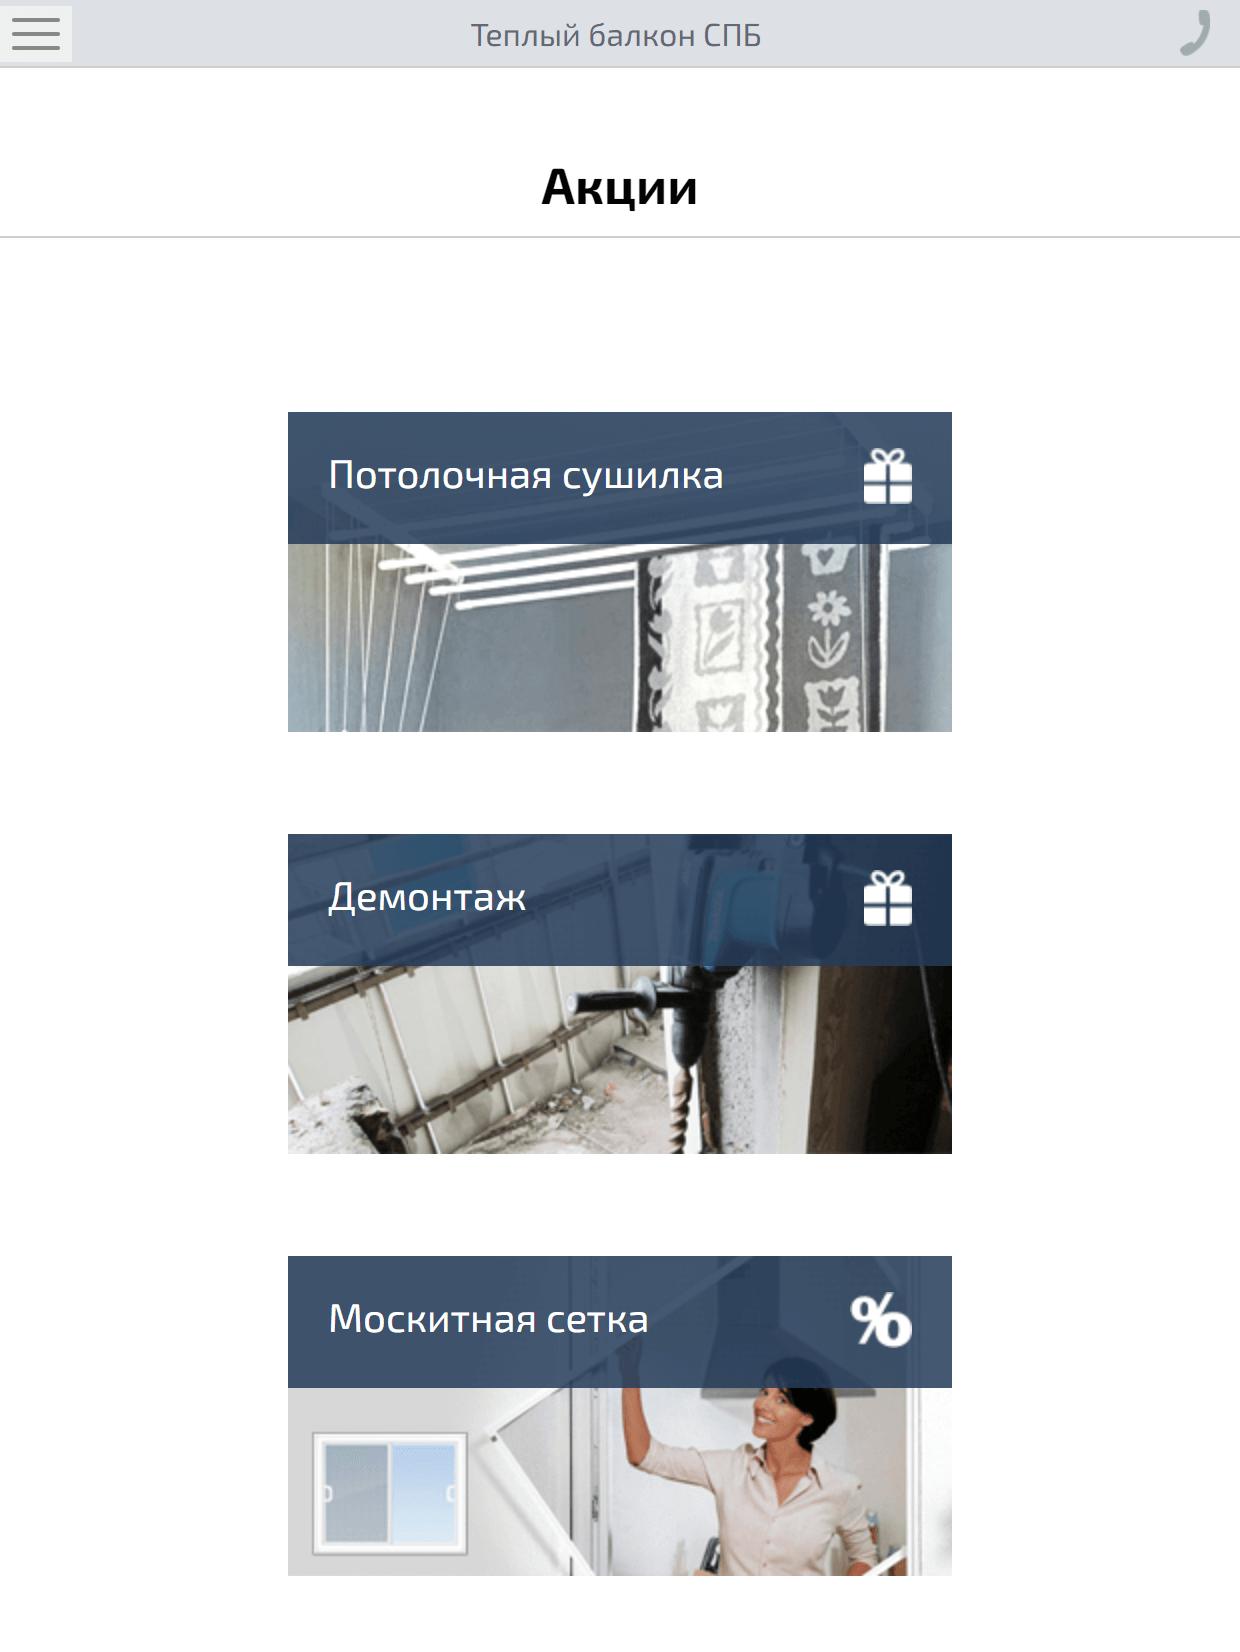 планшетная версия сайта https://balkon-812.ru/